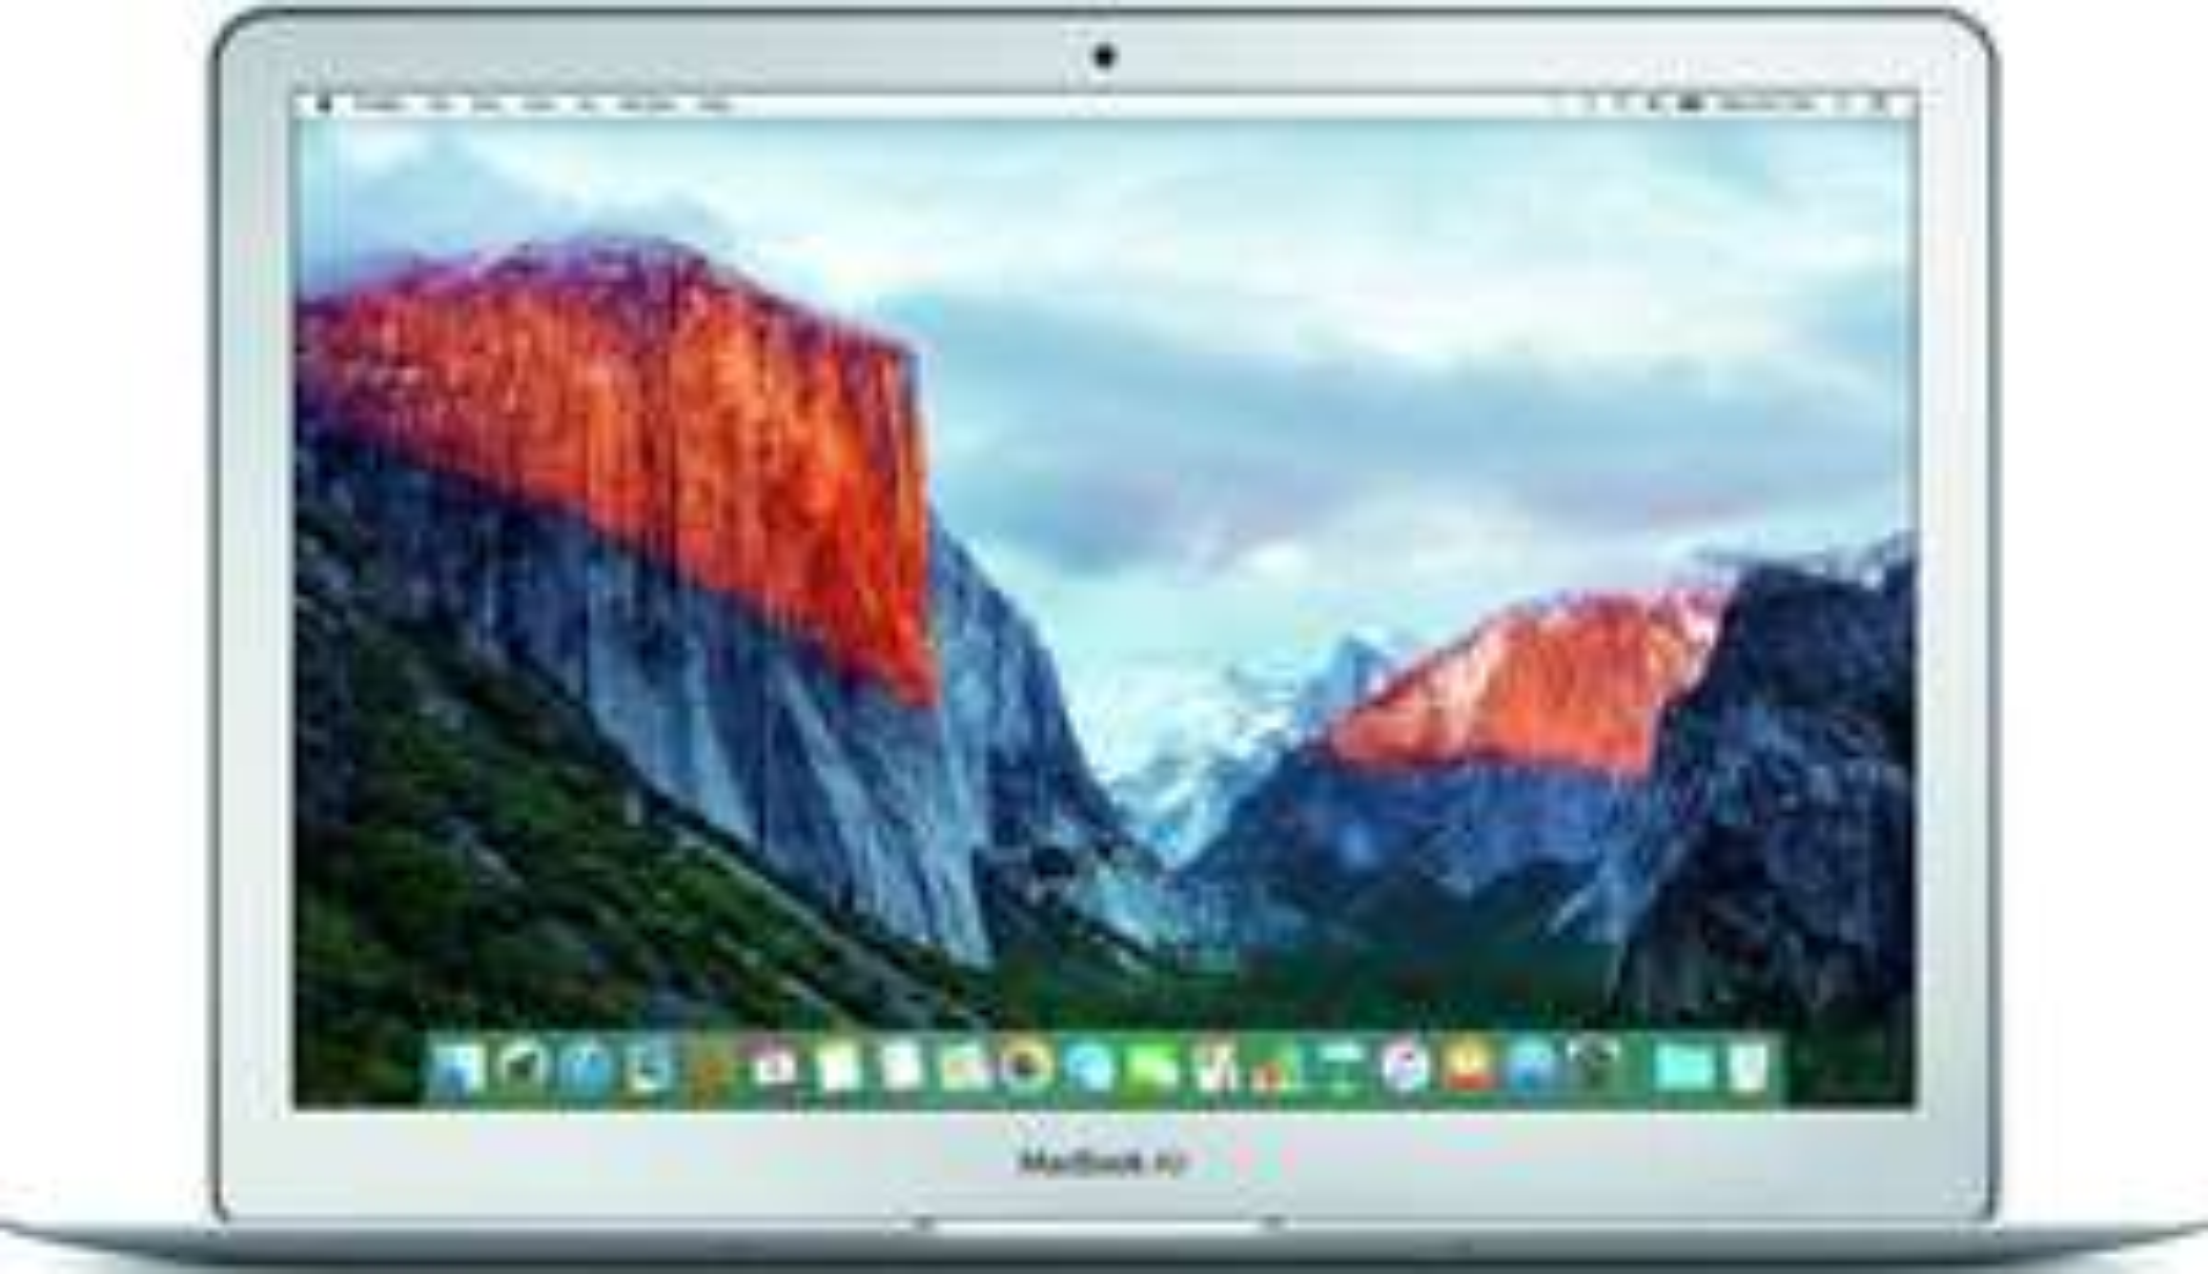 "[SCHWEIZ] MacBook Air 13,3"" 8 GB RAM/128 GB SSD, Core i5 für CHF 799"